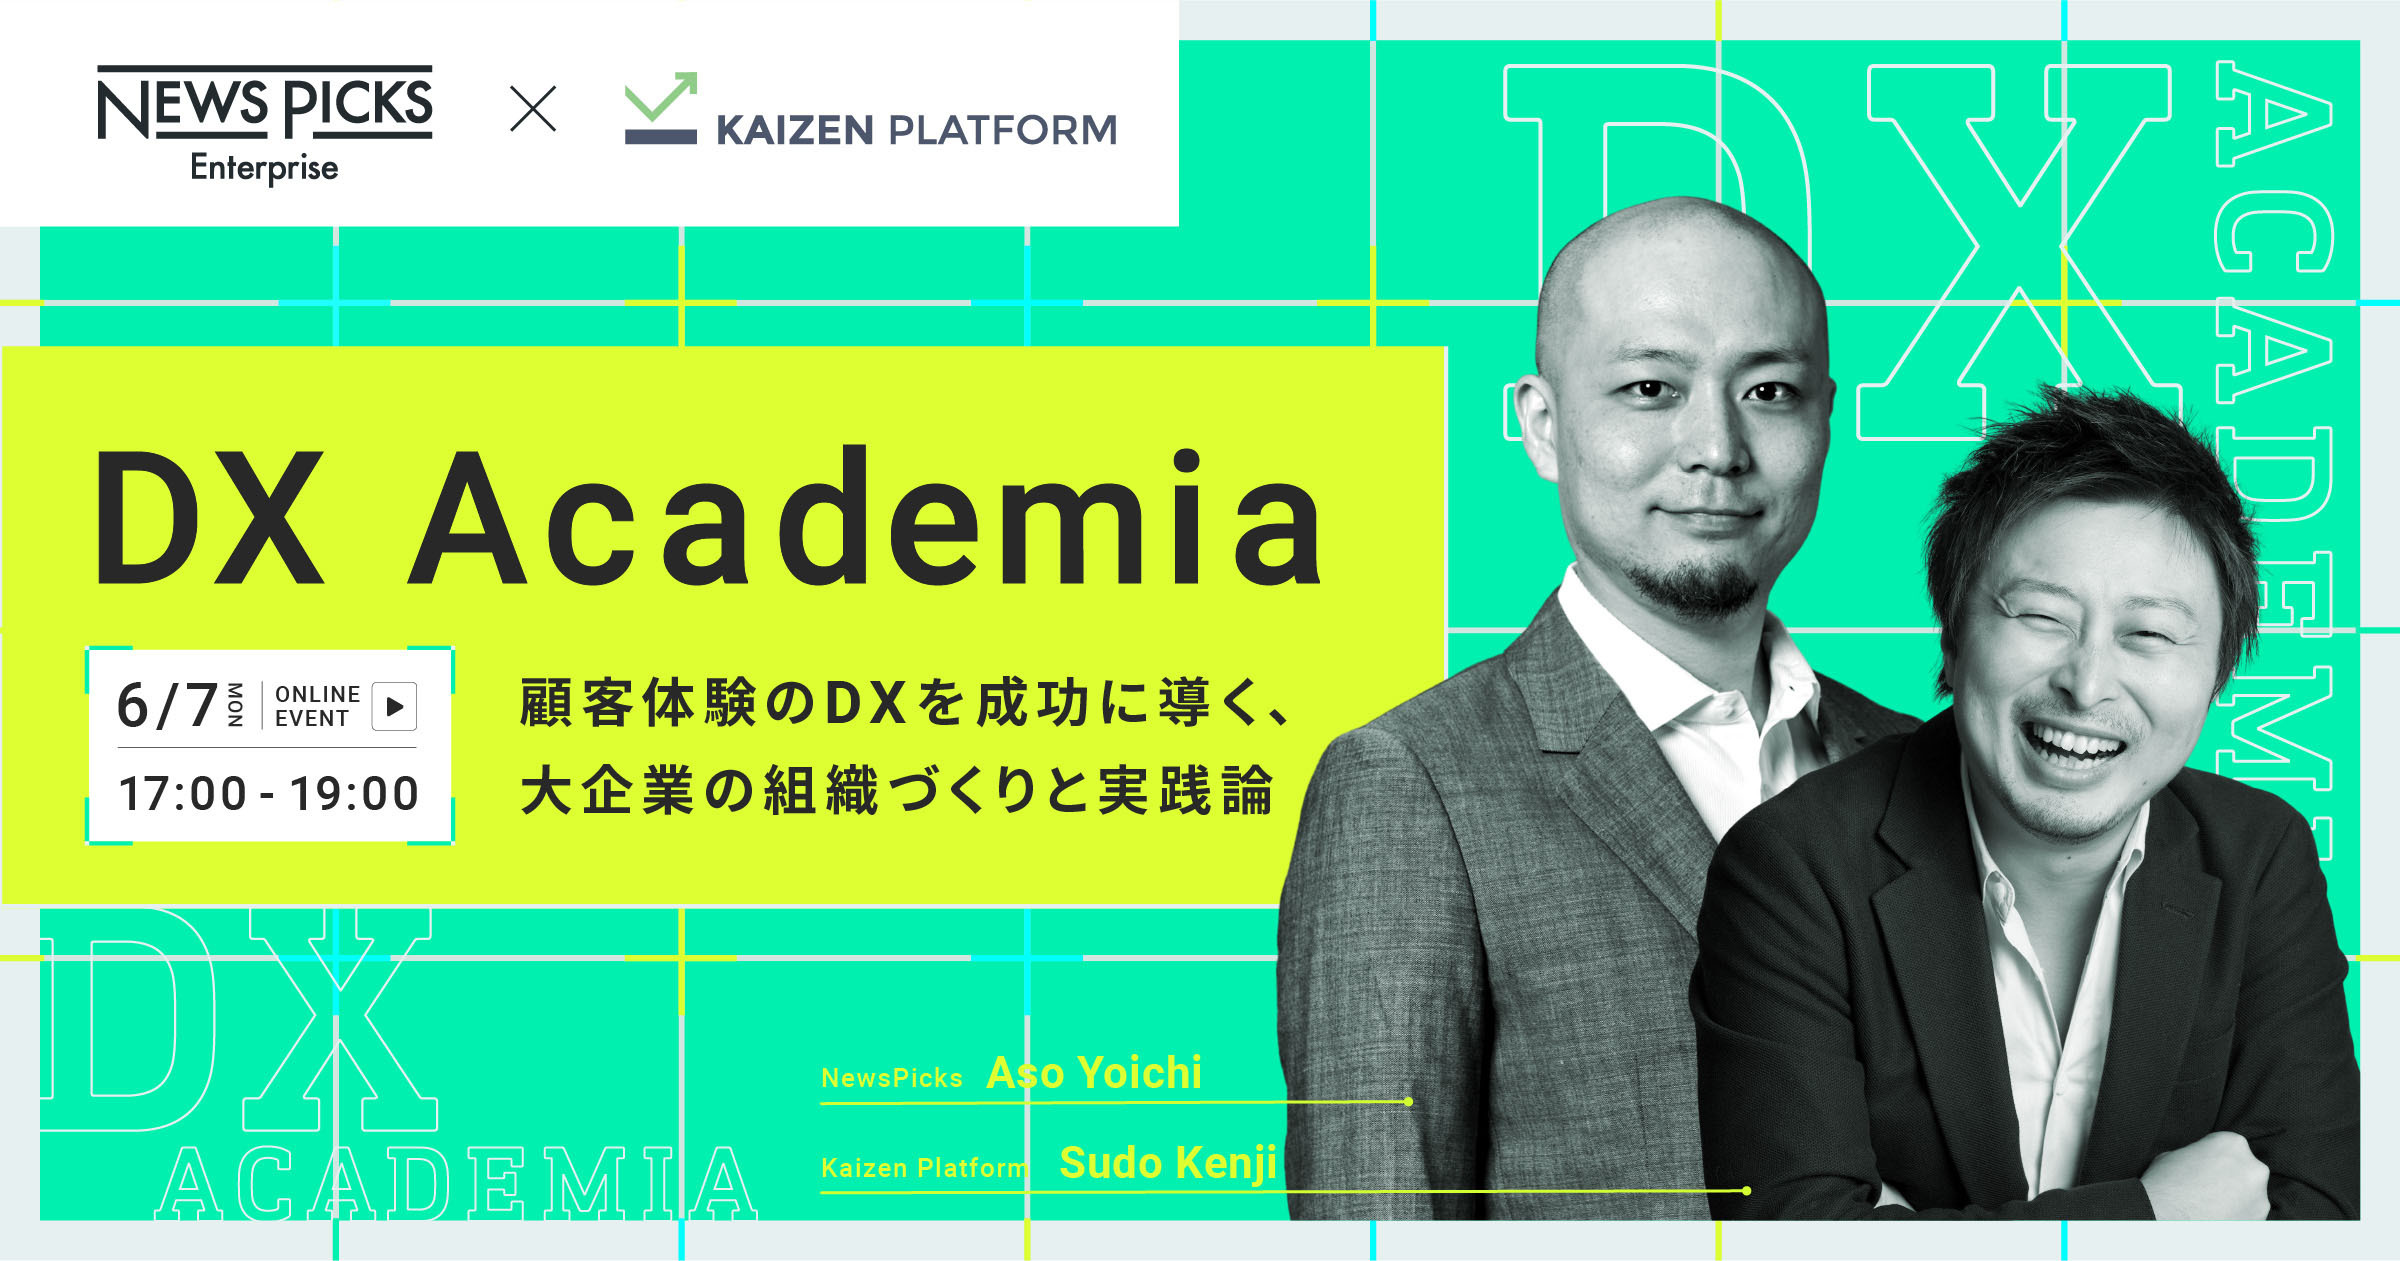 DX Academia 顧客体験のDXを成功に導く、大企業の組織づくりと実践論